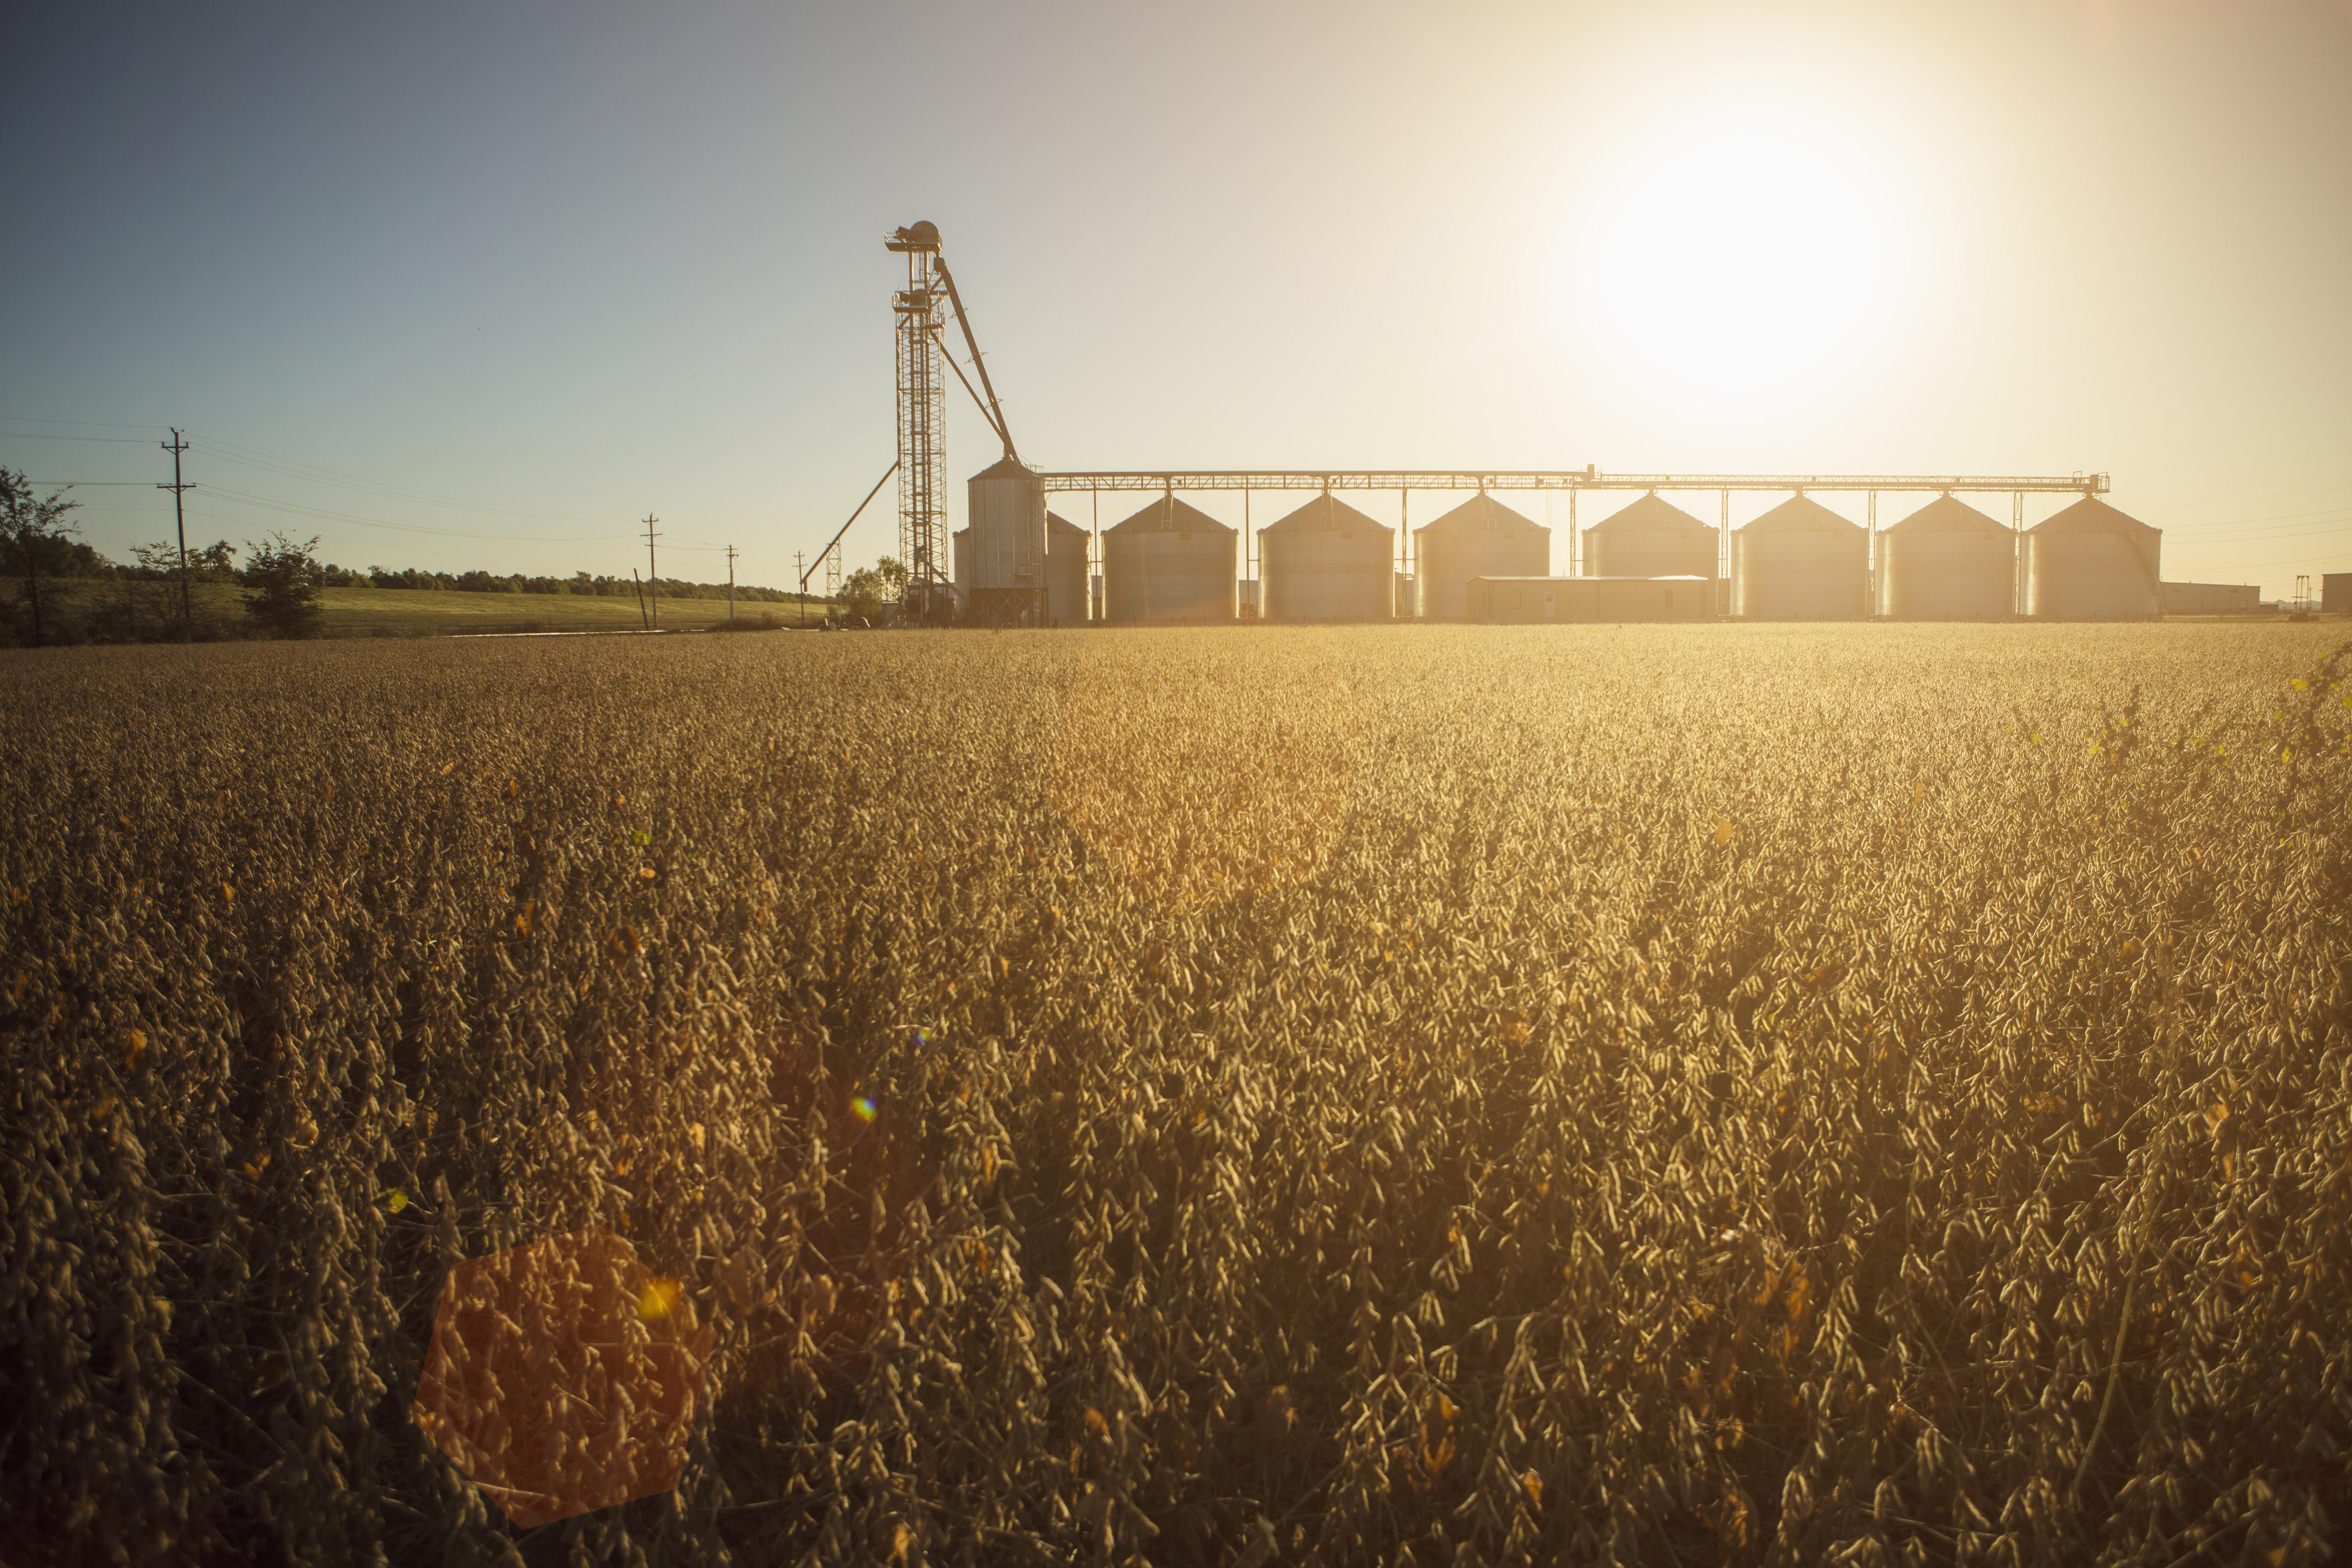 Silos and crops on a farm.